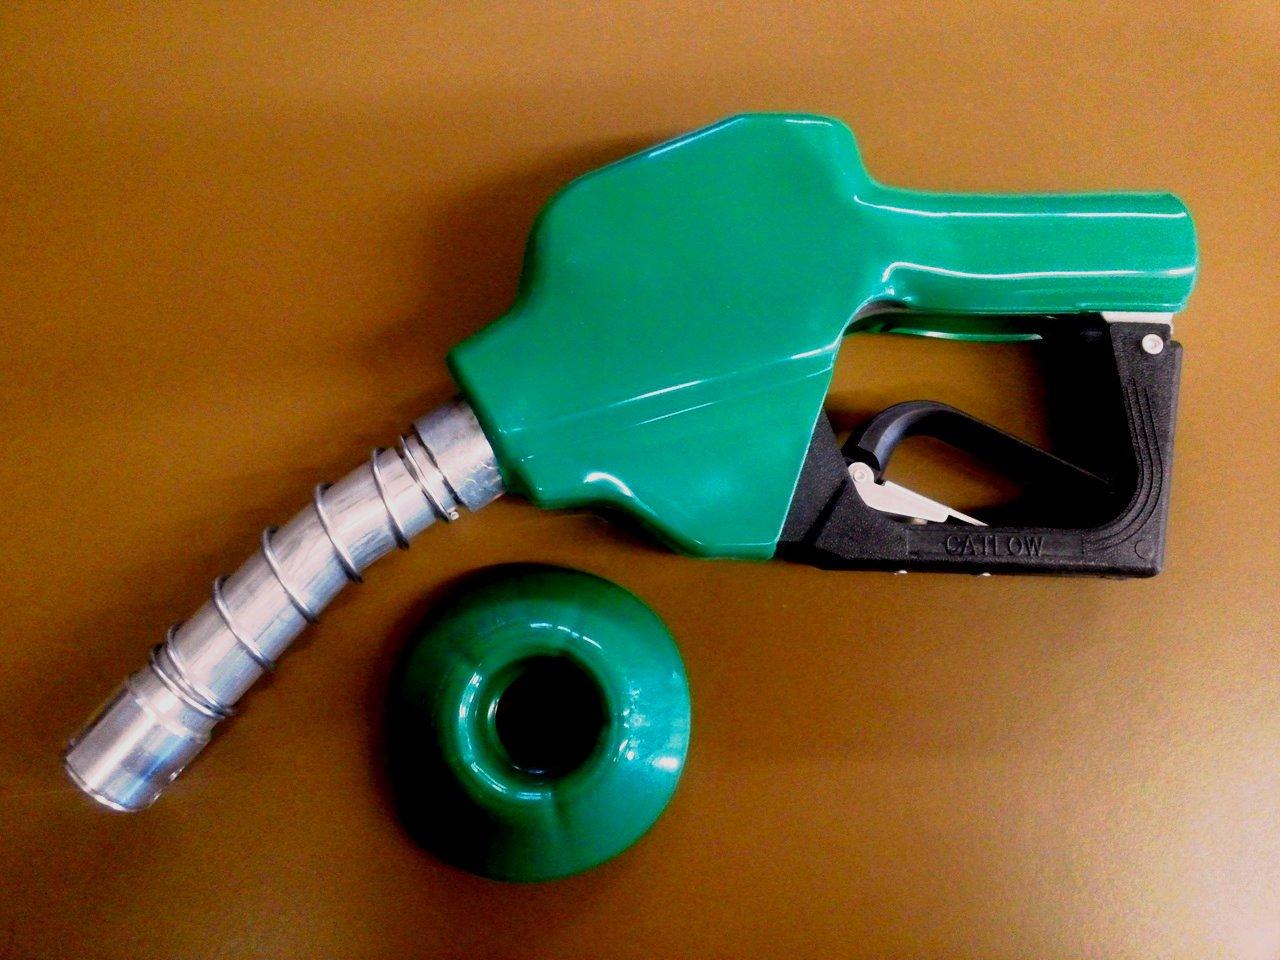 Catlow New Max 1 Prepay Hi-Flow Automatic Diesel Automatic Fuel Nozzle